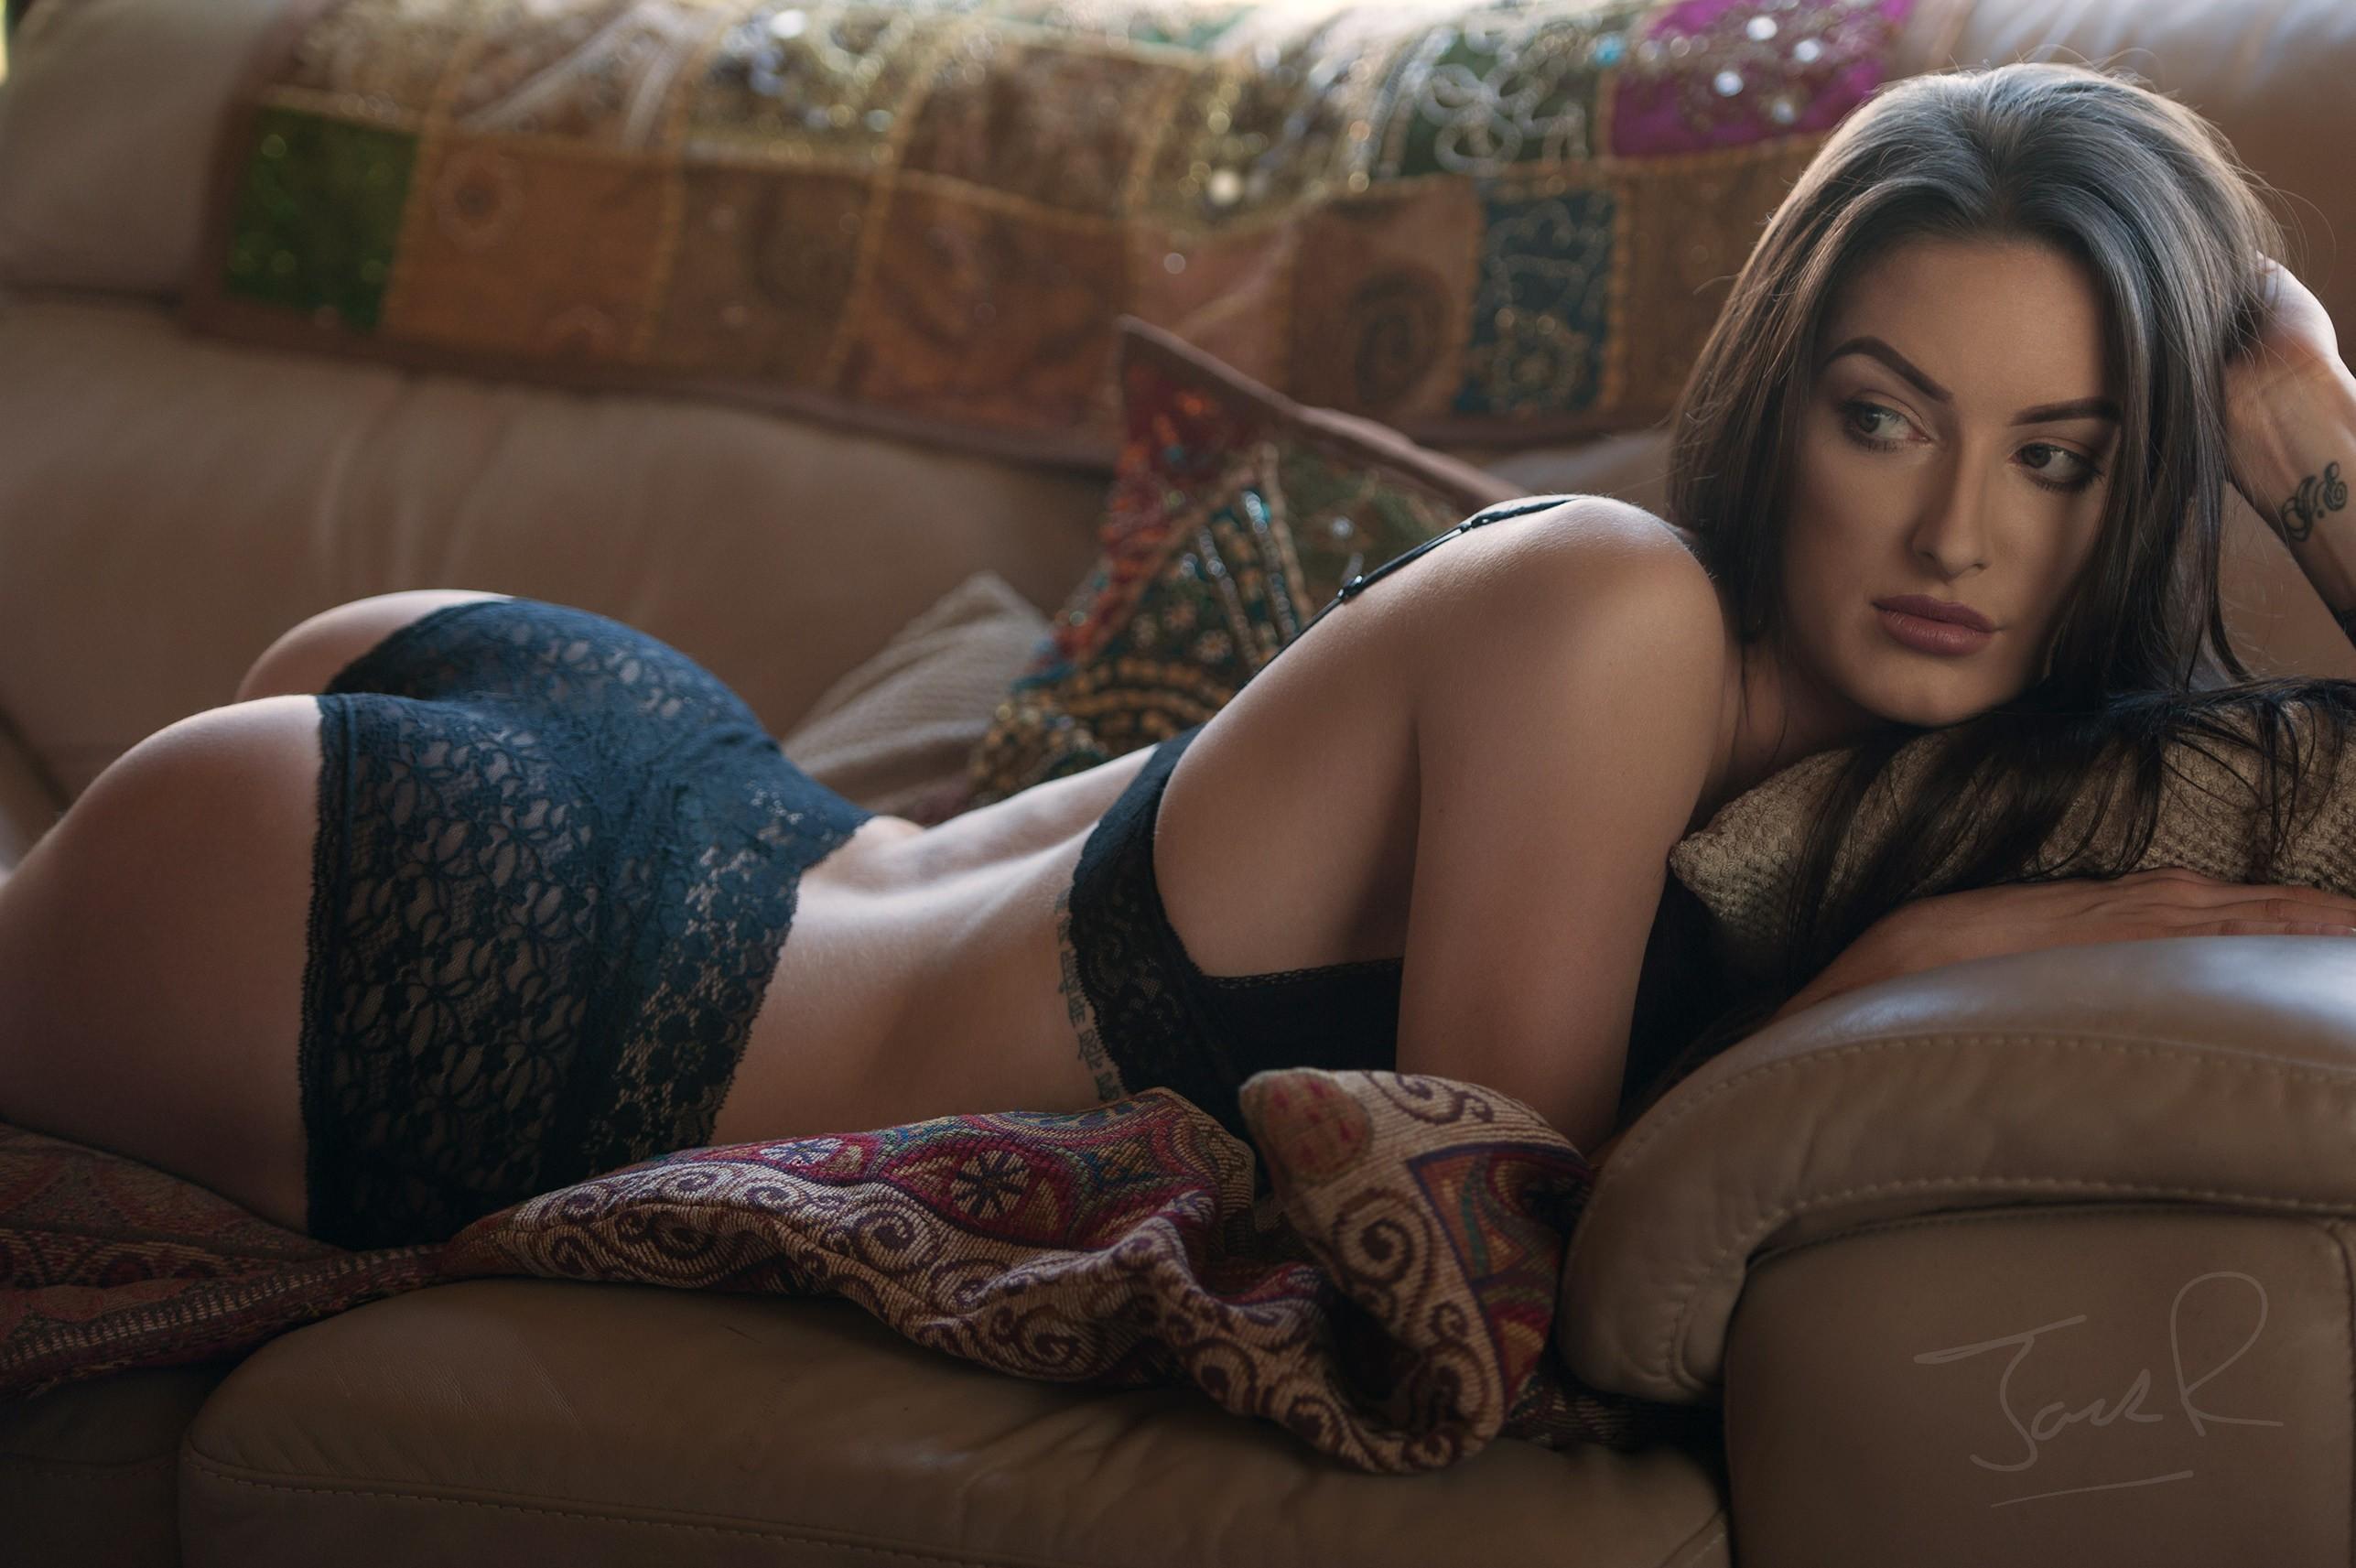 Erotica short stories for lustful women